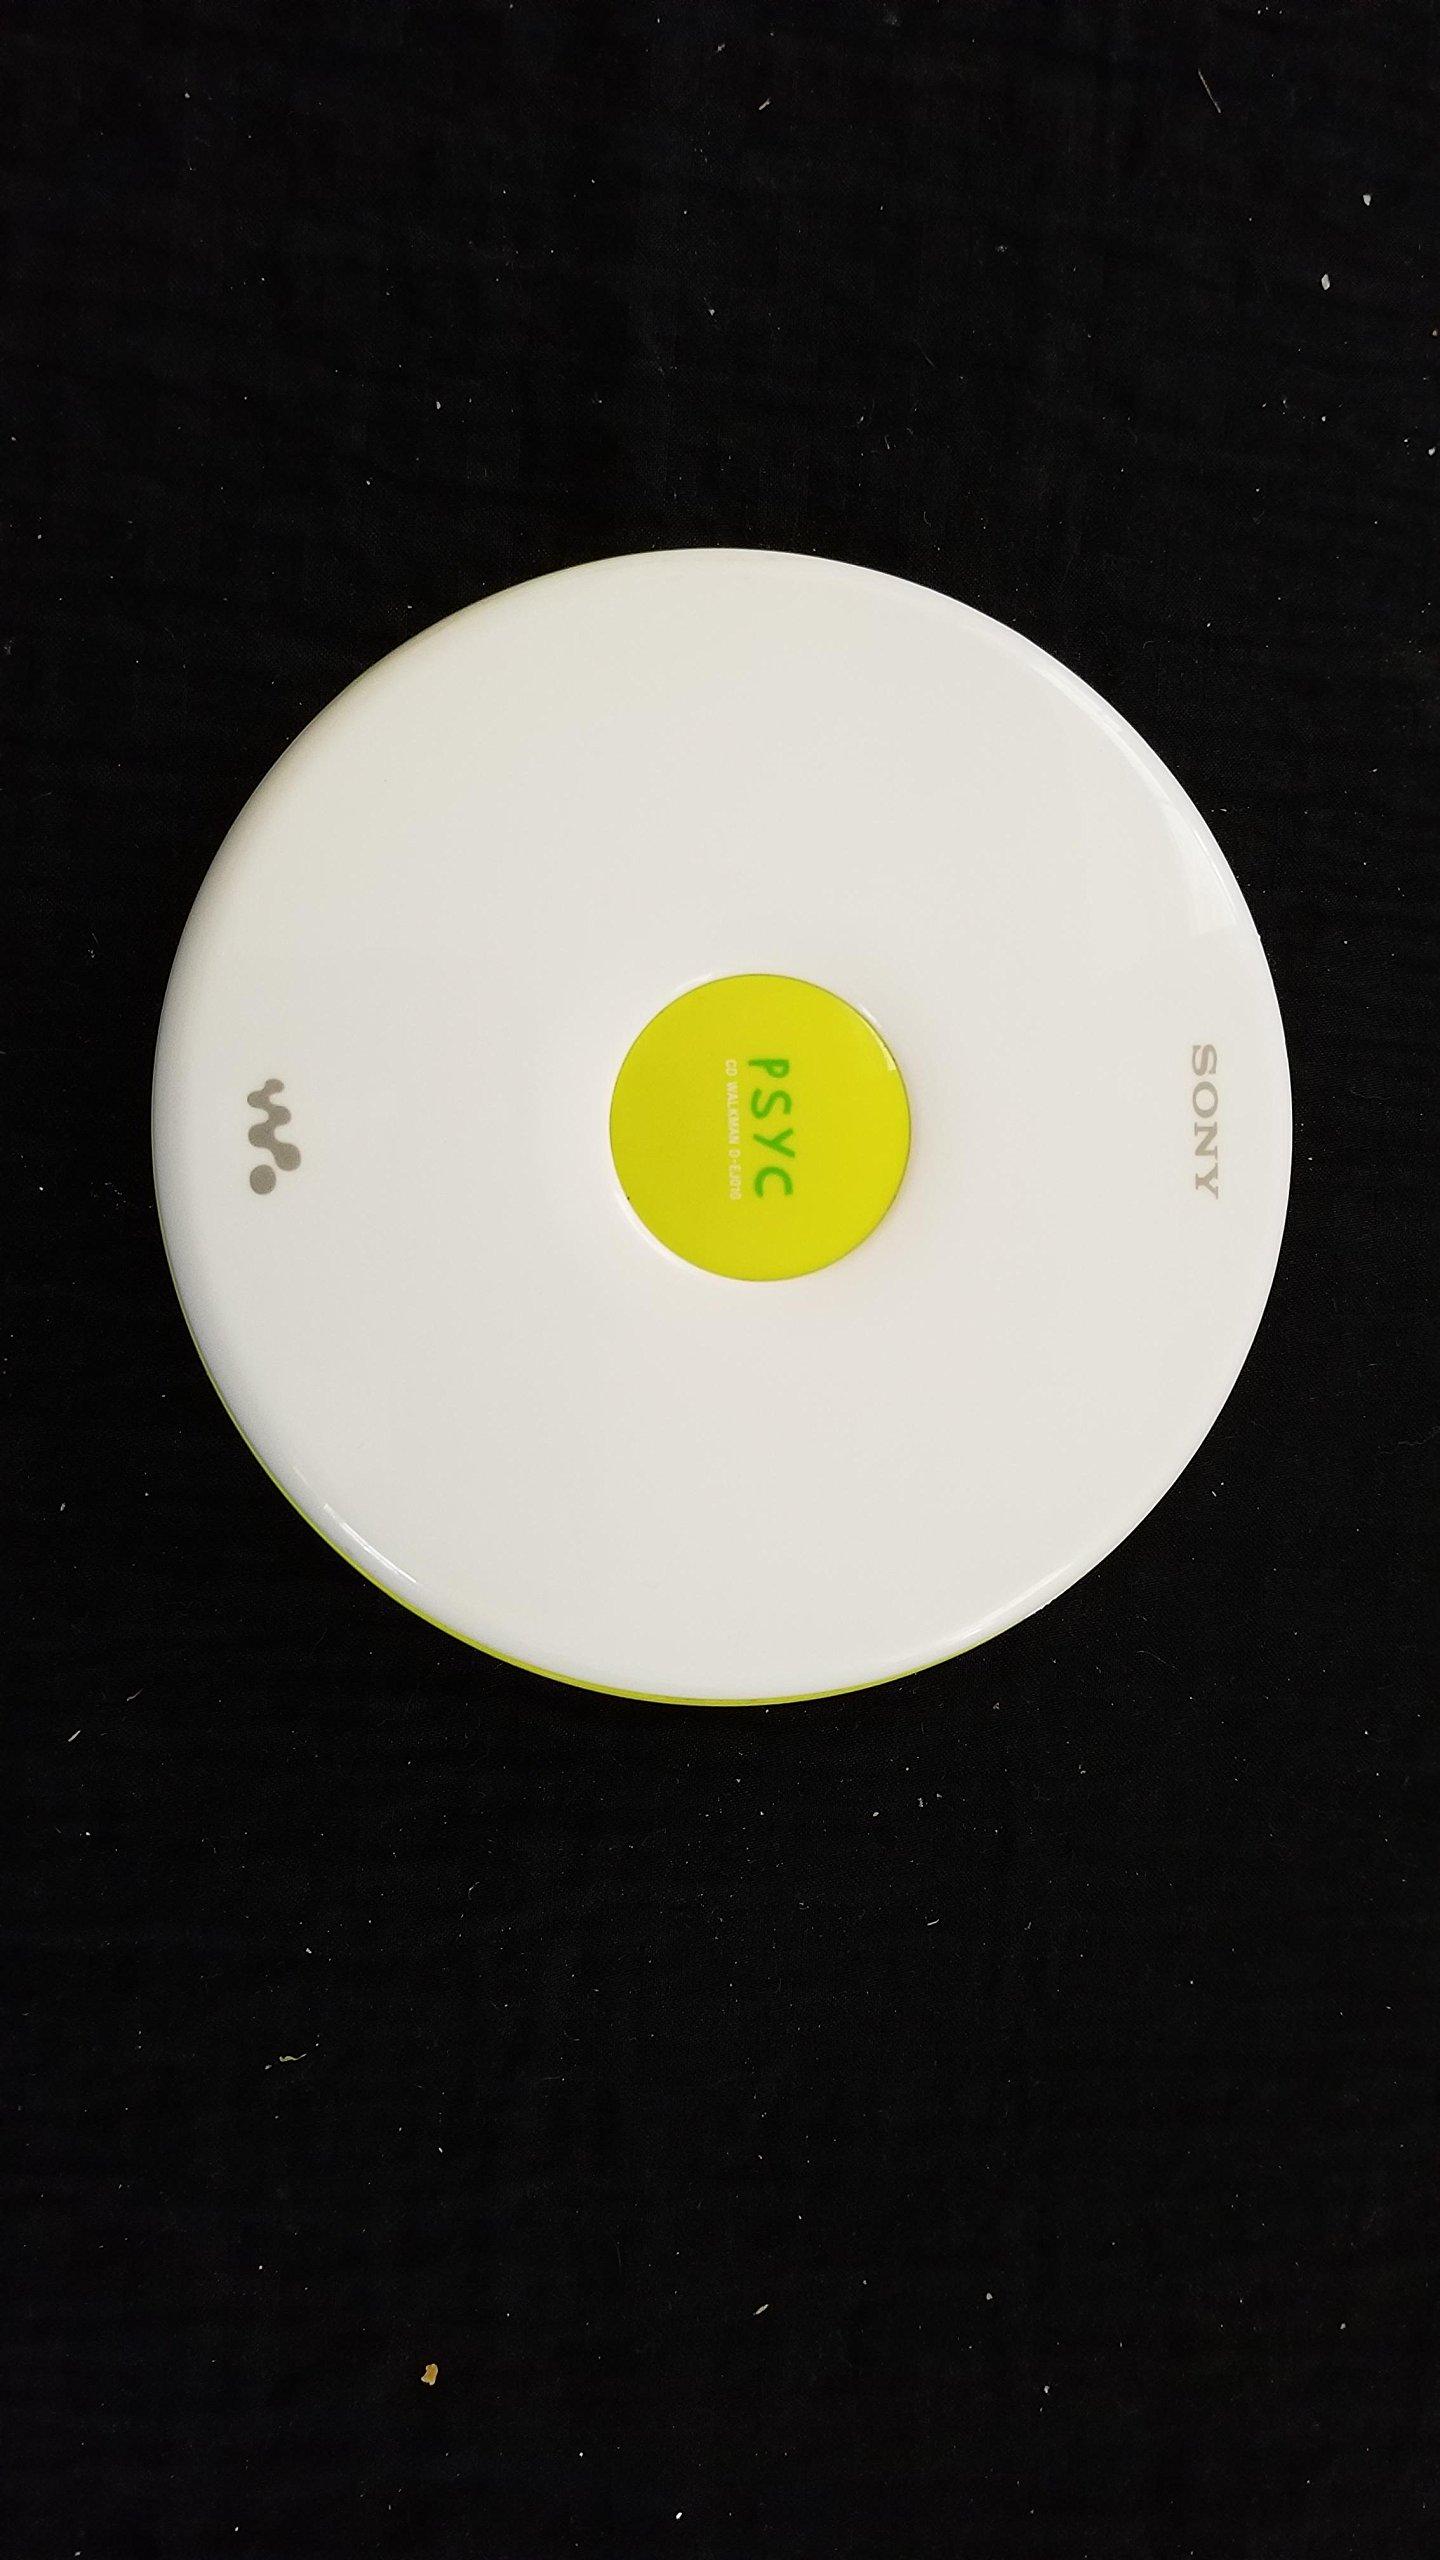 Sony PSYC CD Walkman D-EJ010